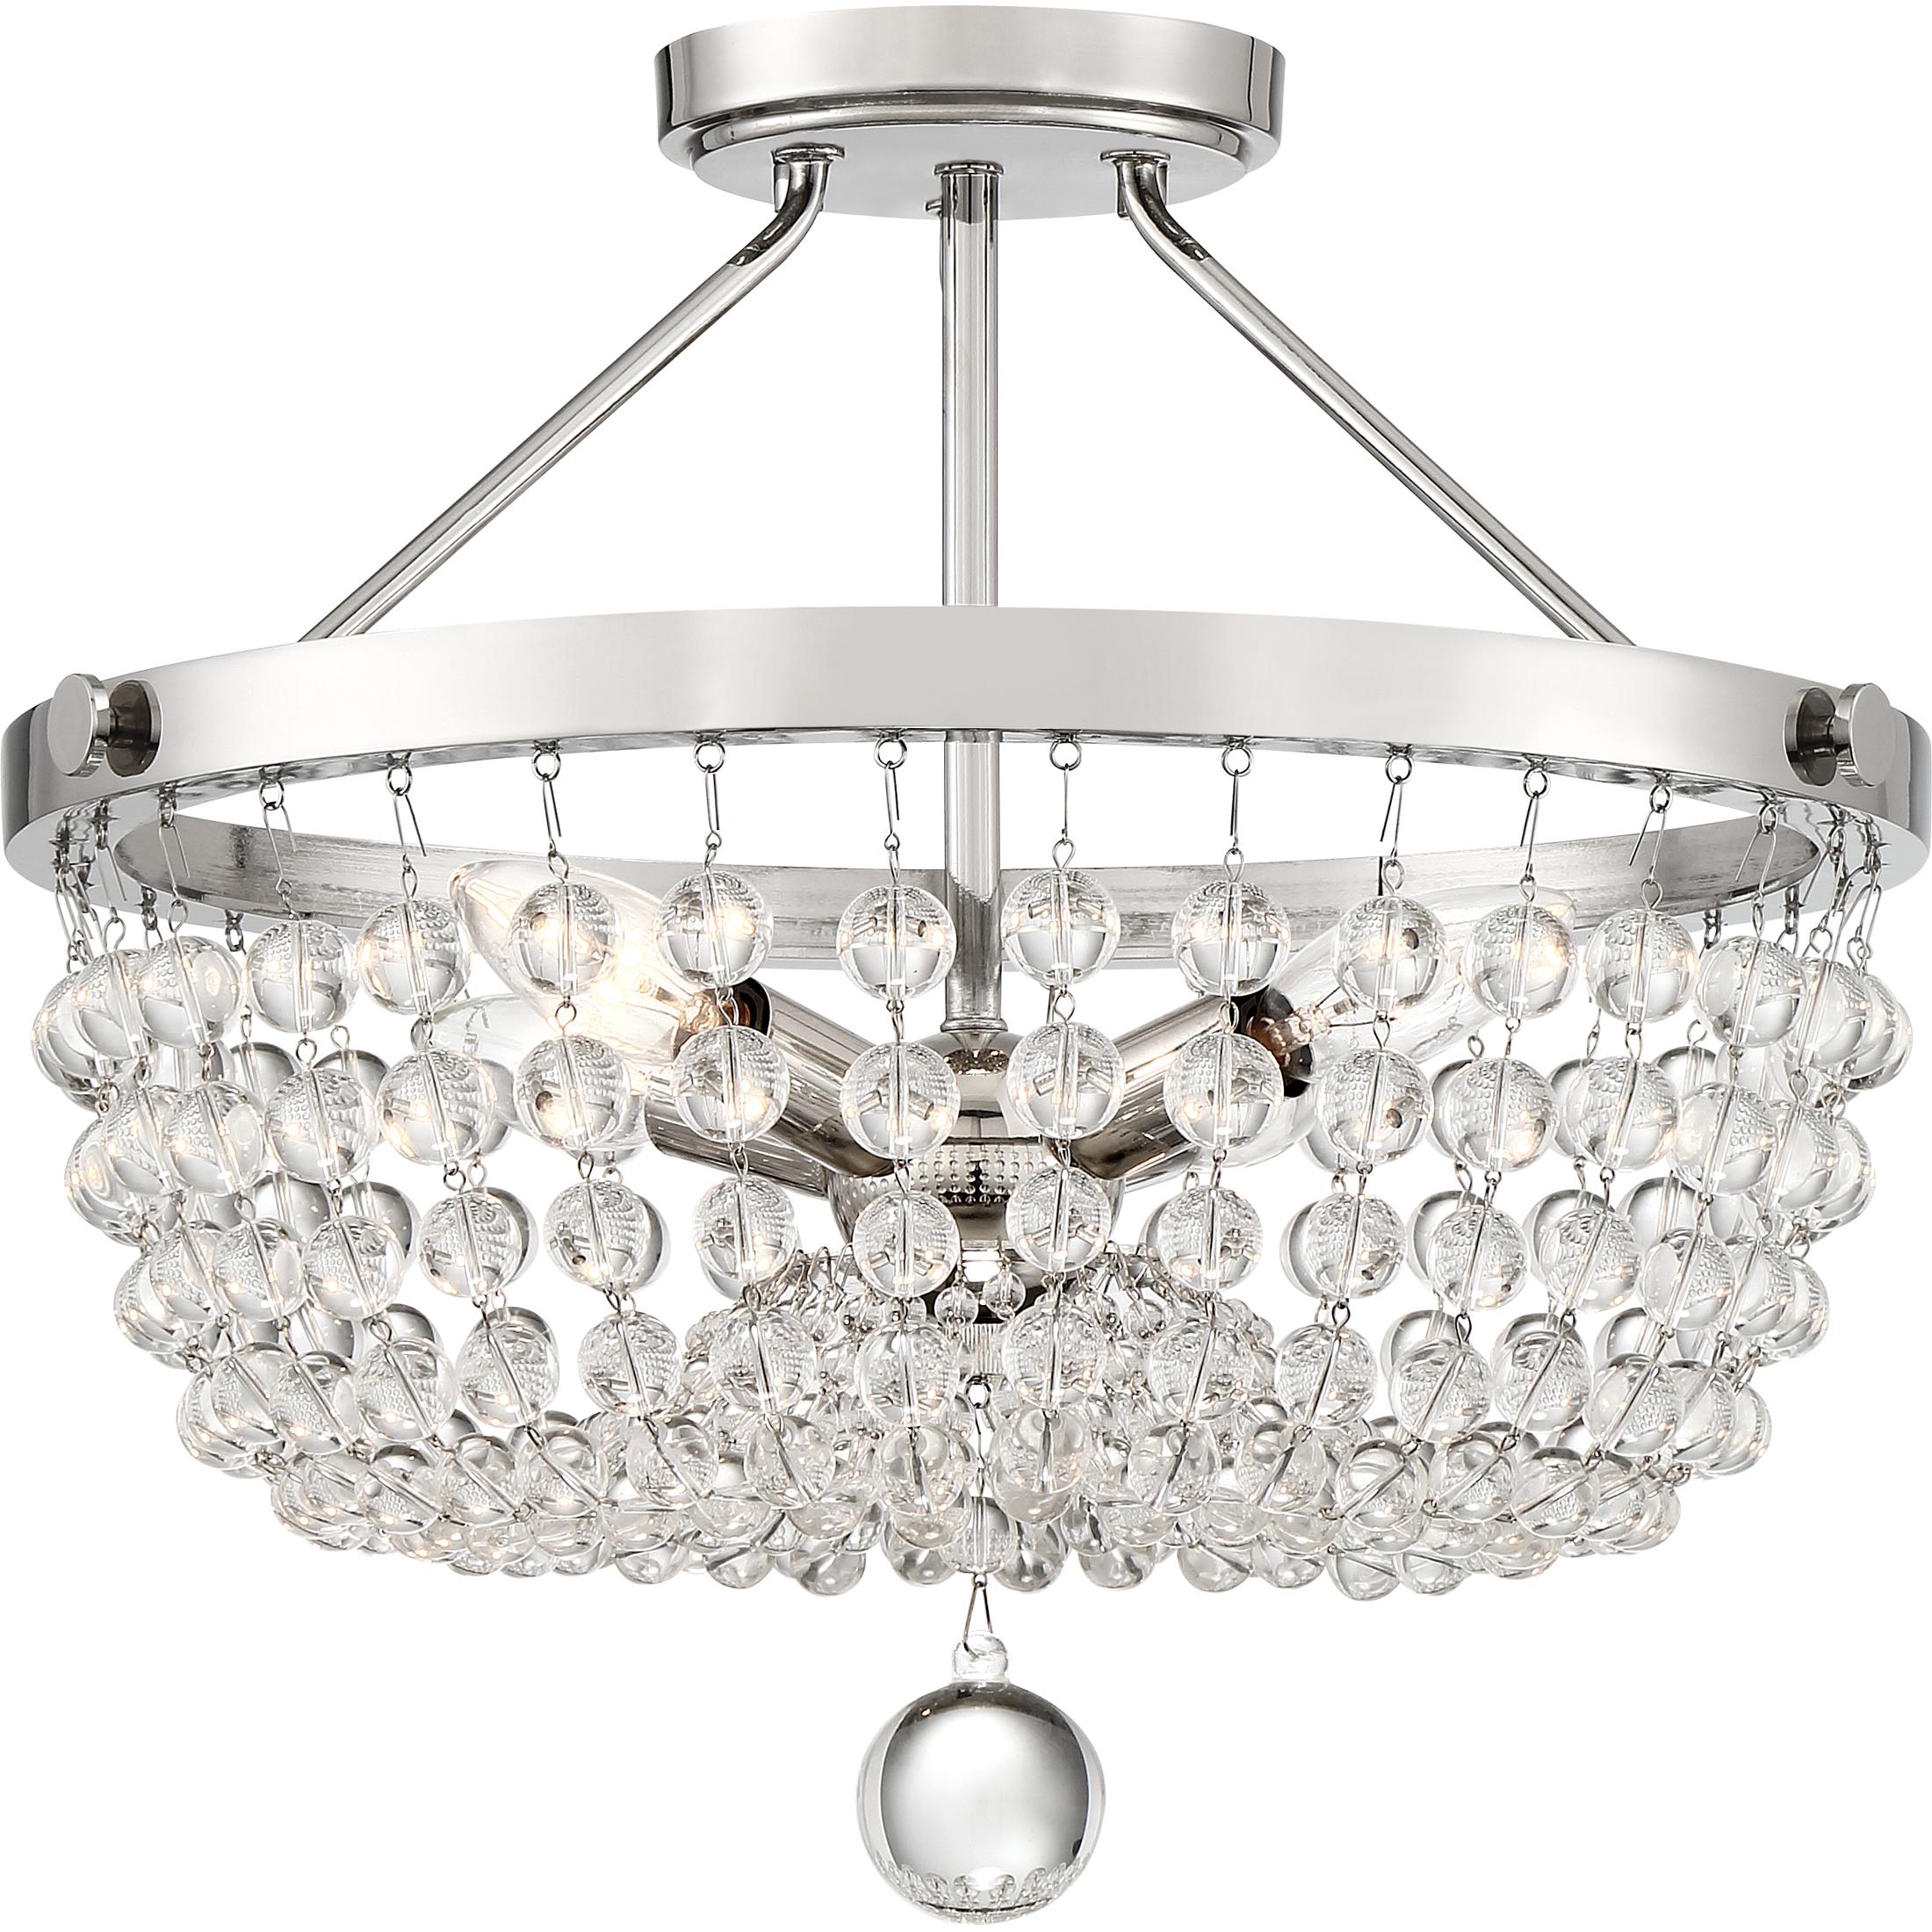 Teresa Semi Flush Ceiling Light By Quoizel Tra1716pk